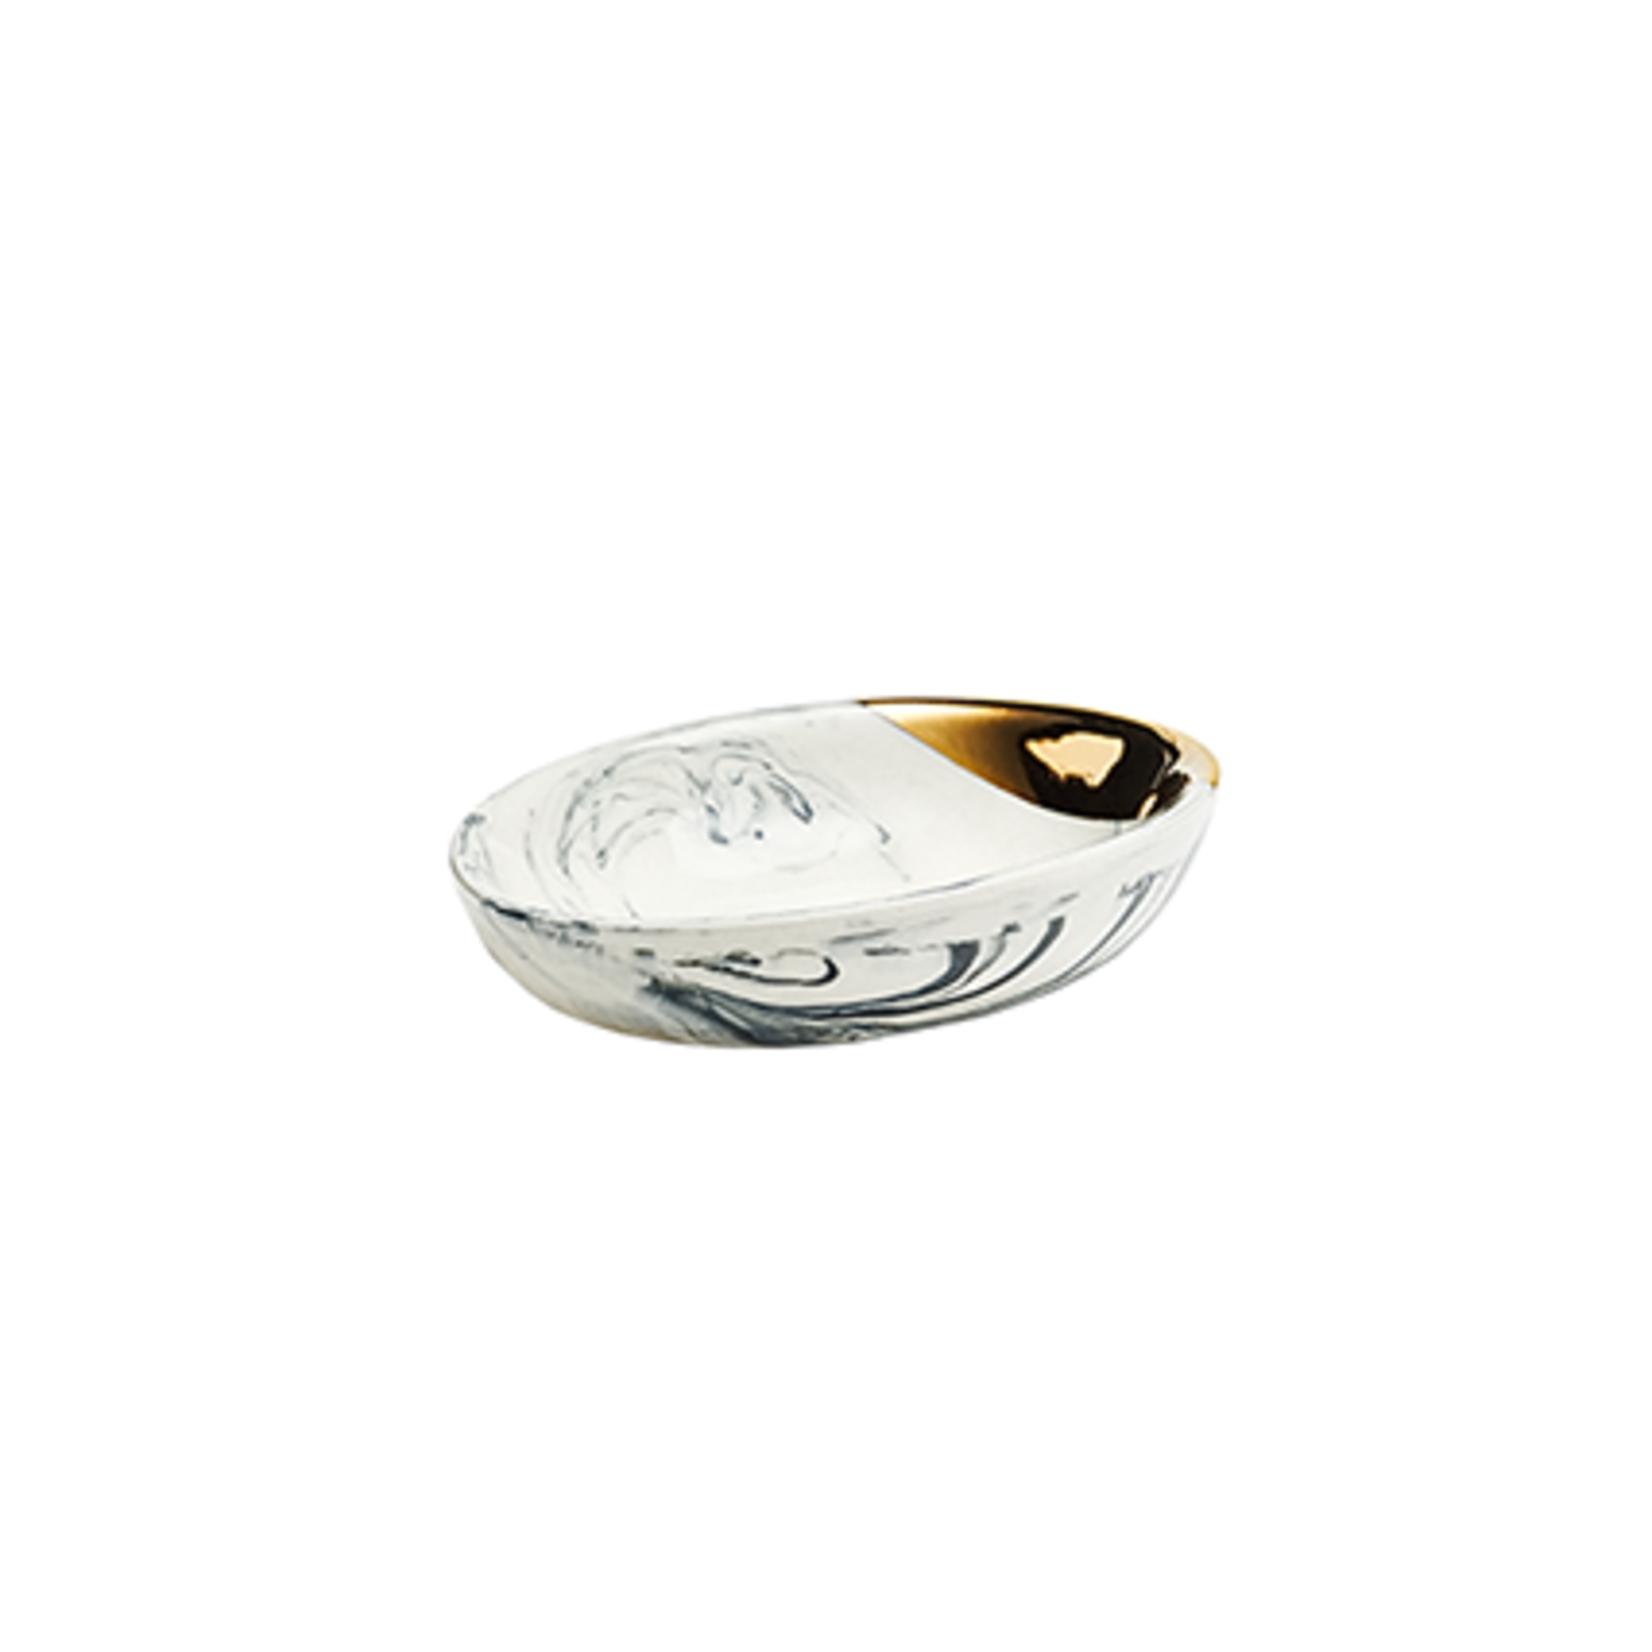 Eliana Bernard Ceramics Eliana Bernard Small Oval Dish in Black Marbling